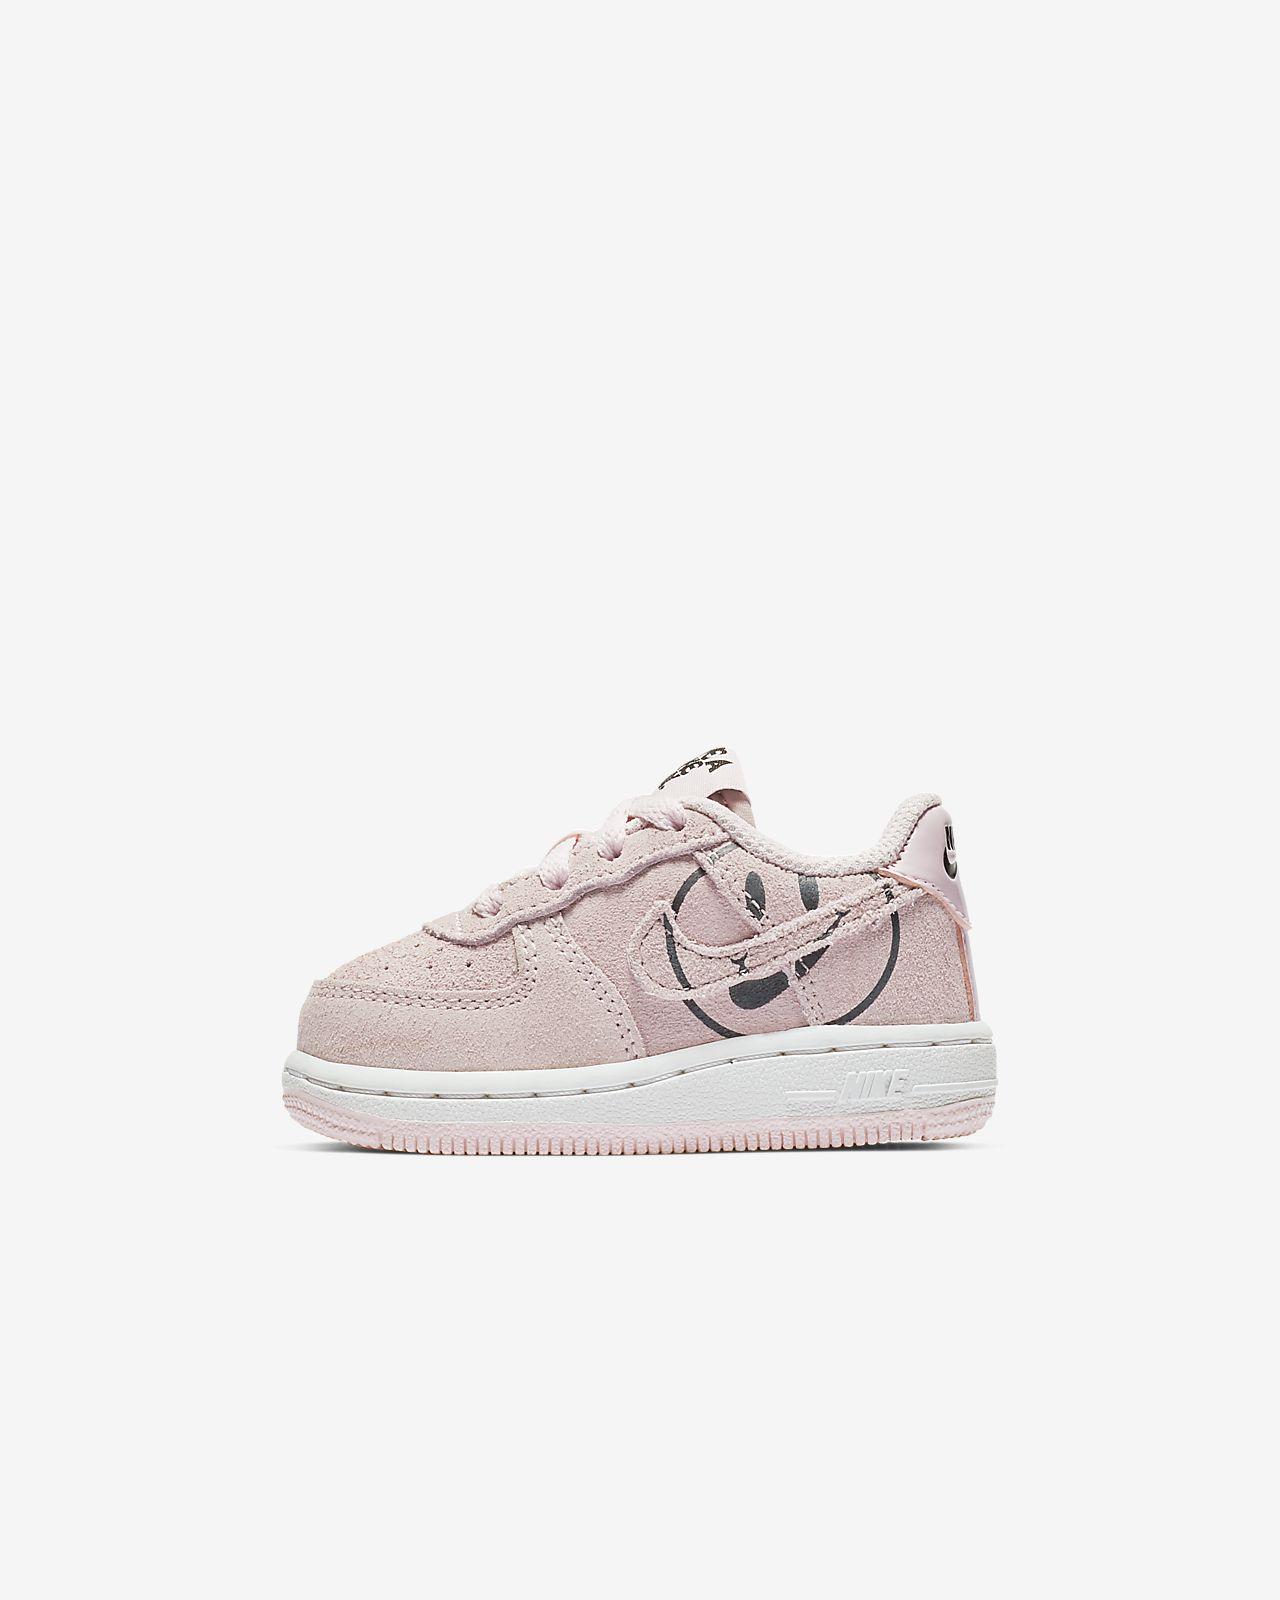 Nike Air Force 1 LV8 2 chaussures enfants rose